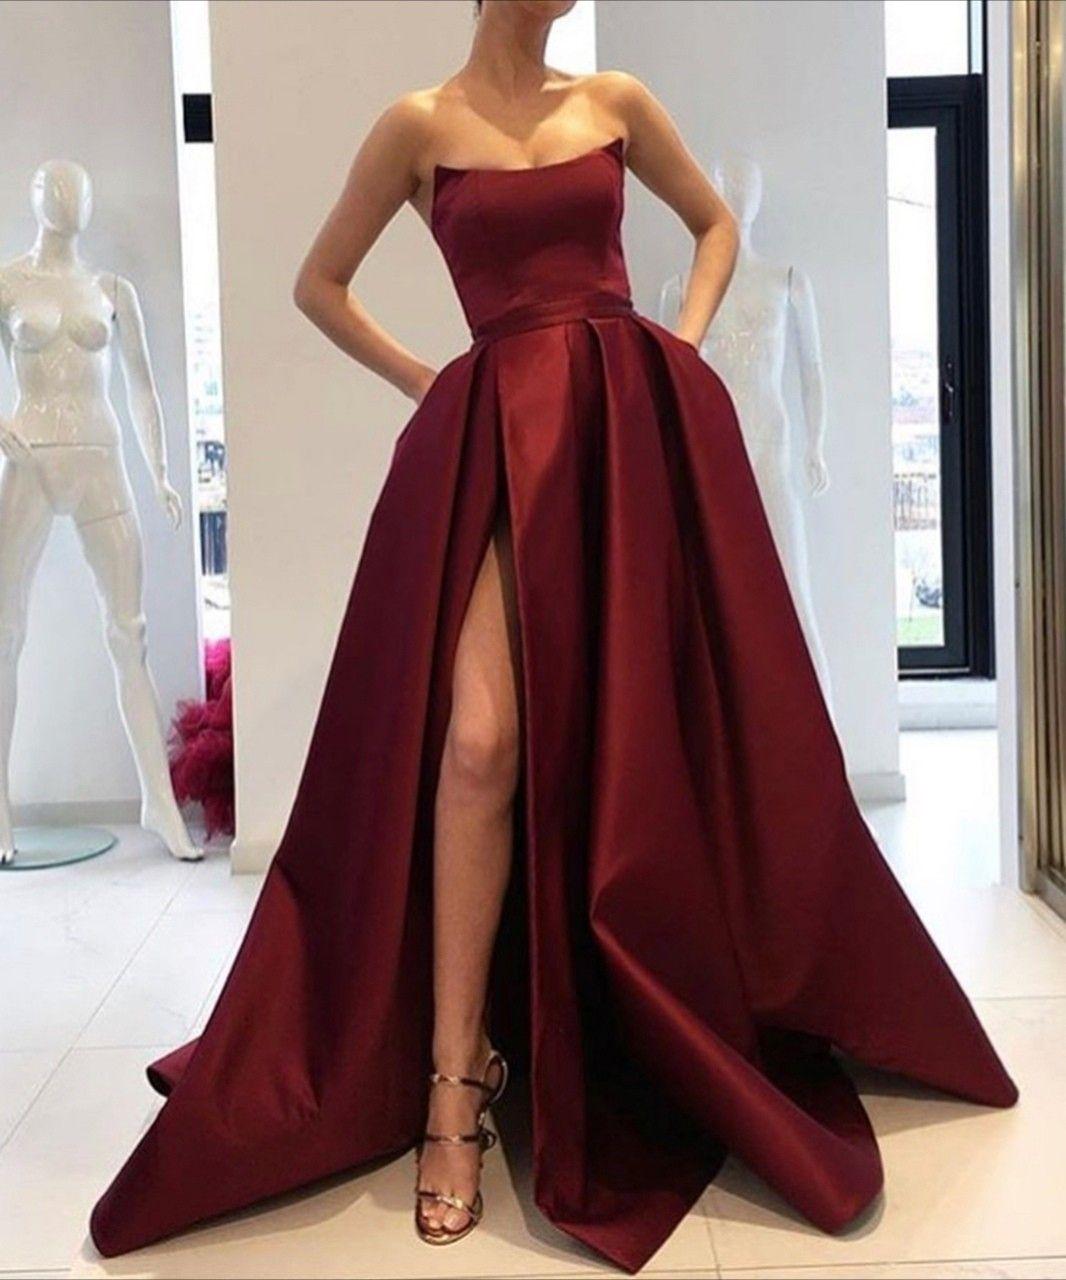 Pin by weirdo on beauty u fashion pinterest prom dresses